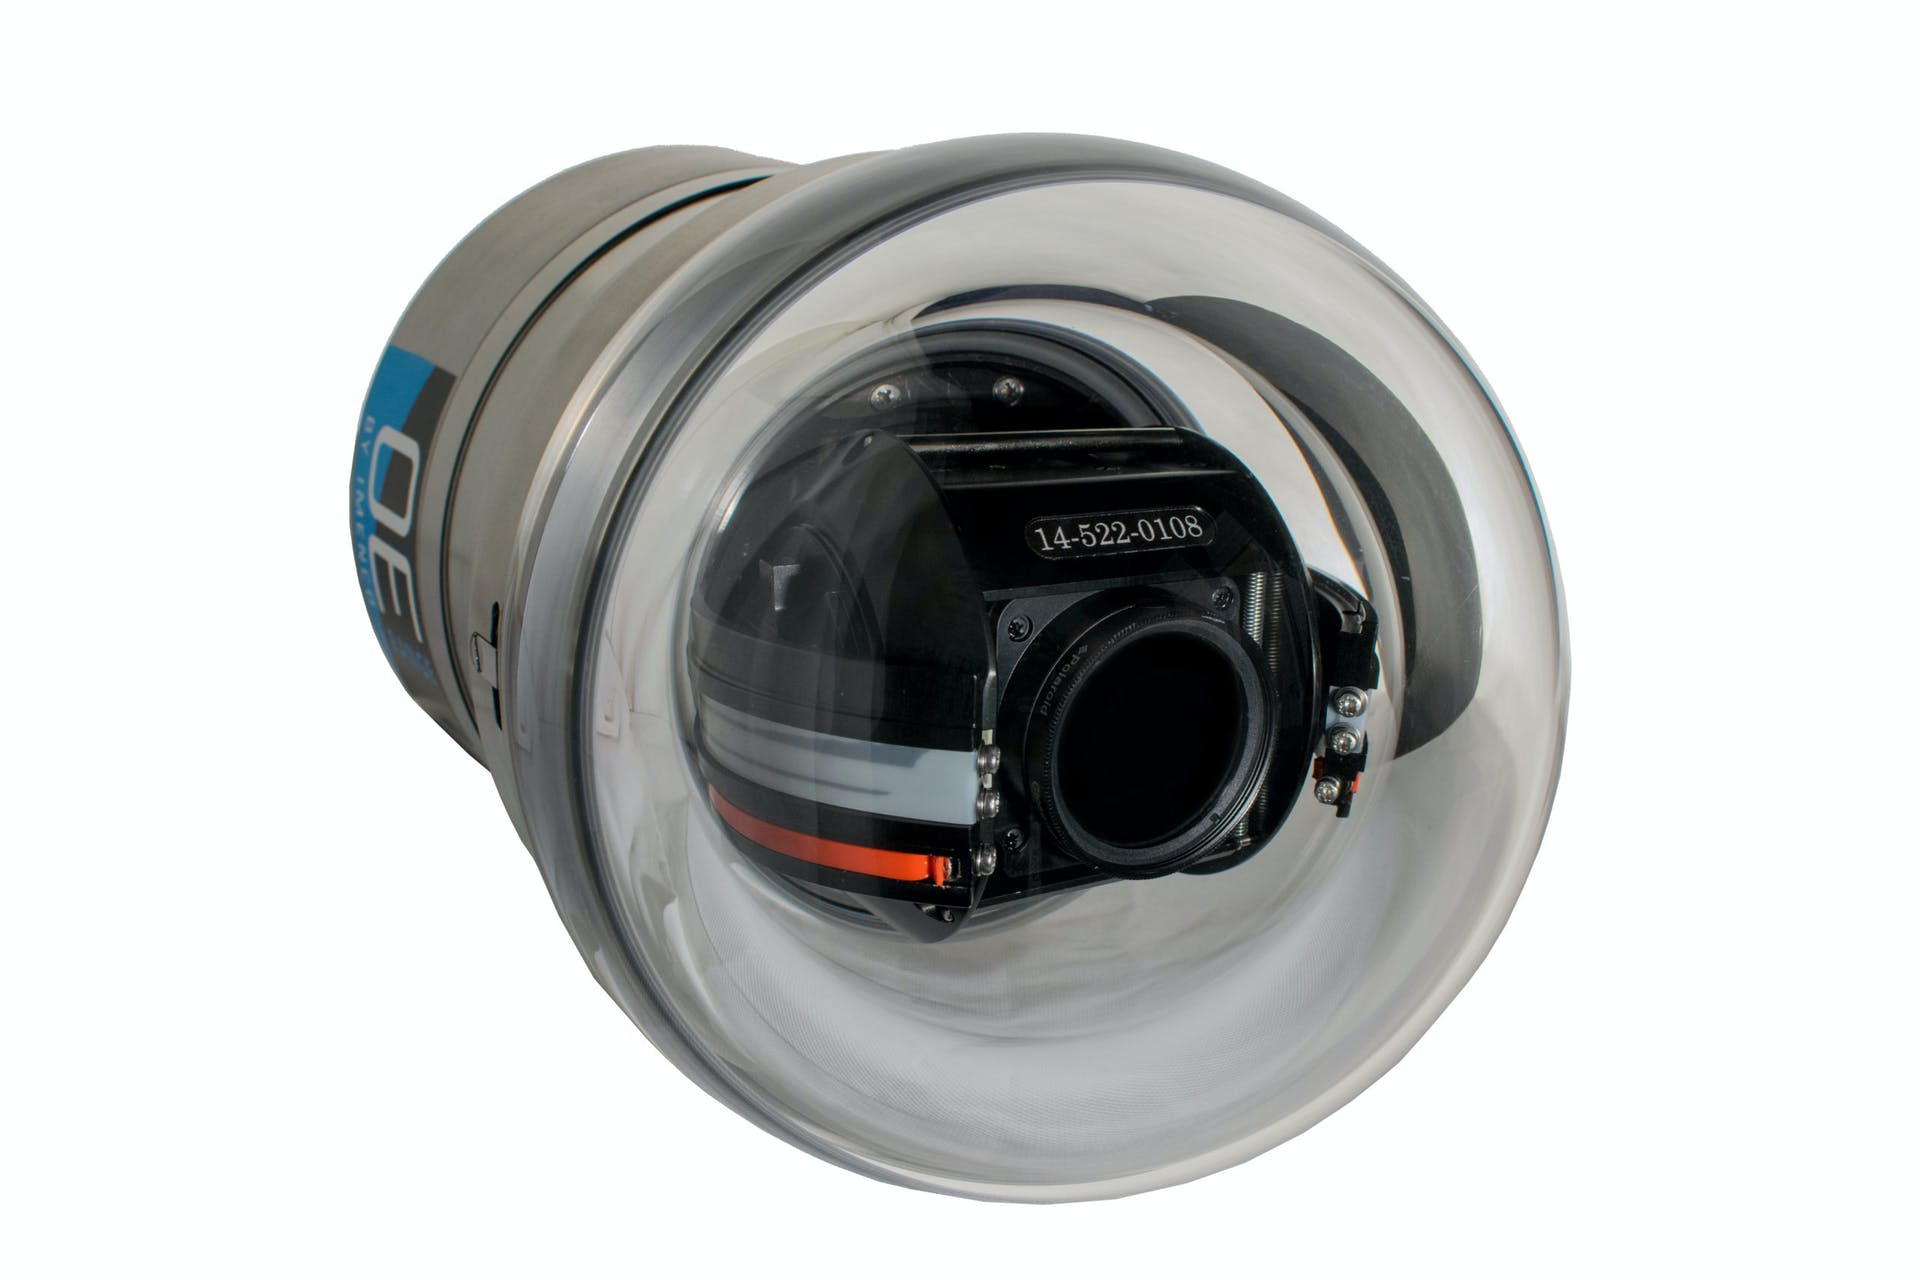 High Definition Pan and Tilt Zoom (PATZ) Colour Camera